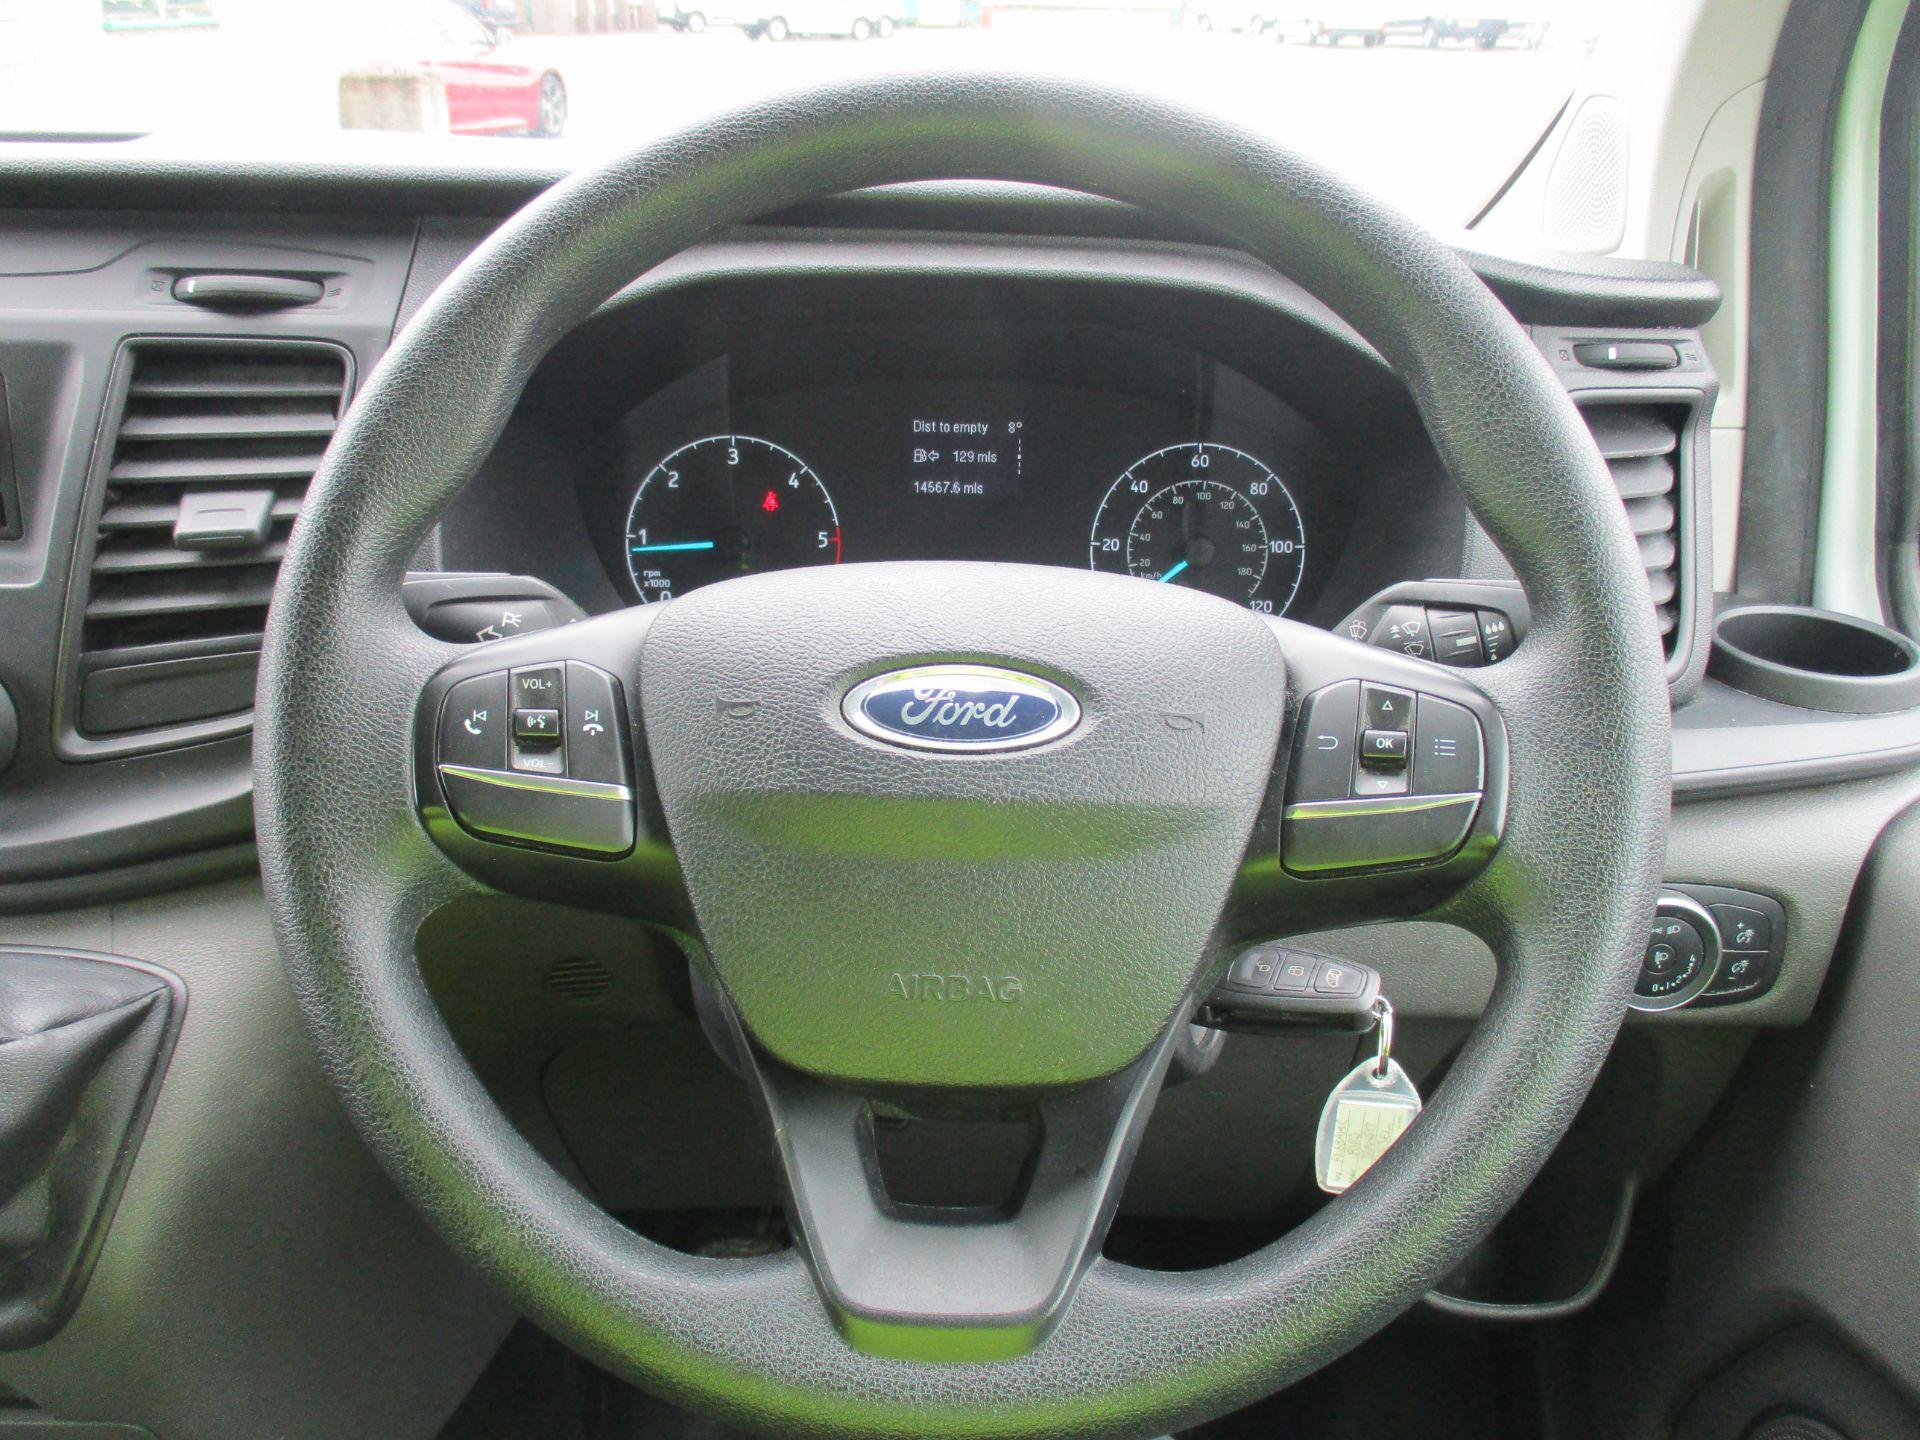 2018 Ford Transit Custom 300 L1 DIESEL FWD 2.0 TDCI 105PS LOW ROOF VAN EURO 6 (FL68AHC) Image 16